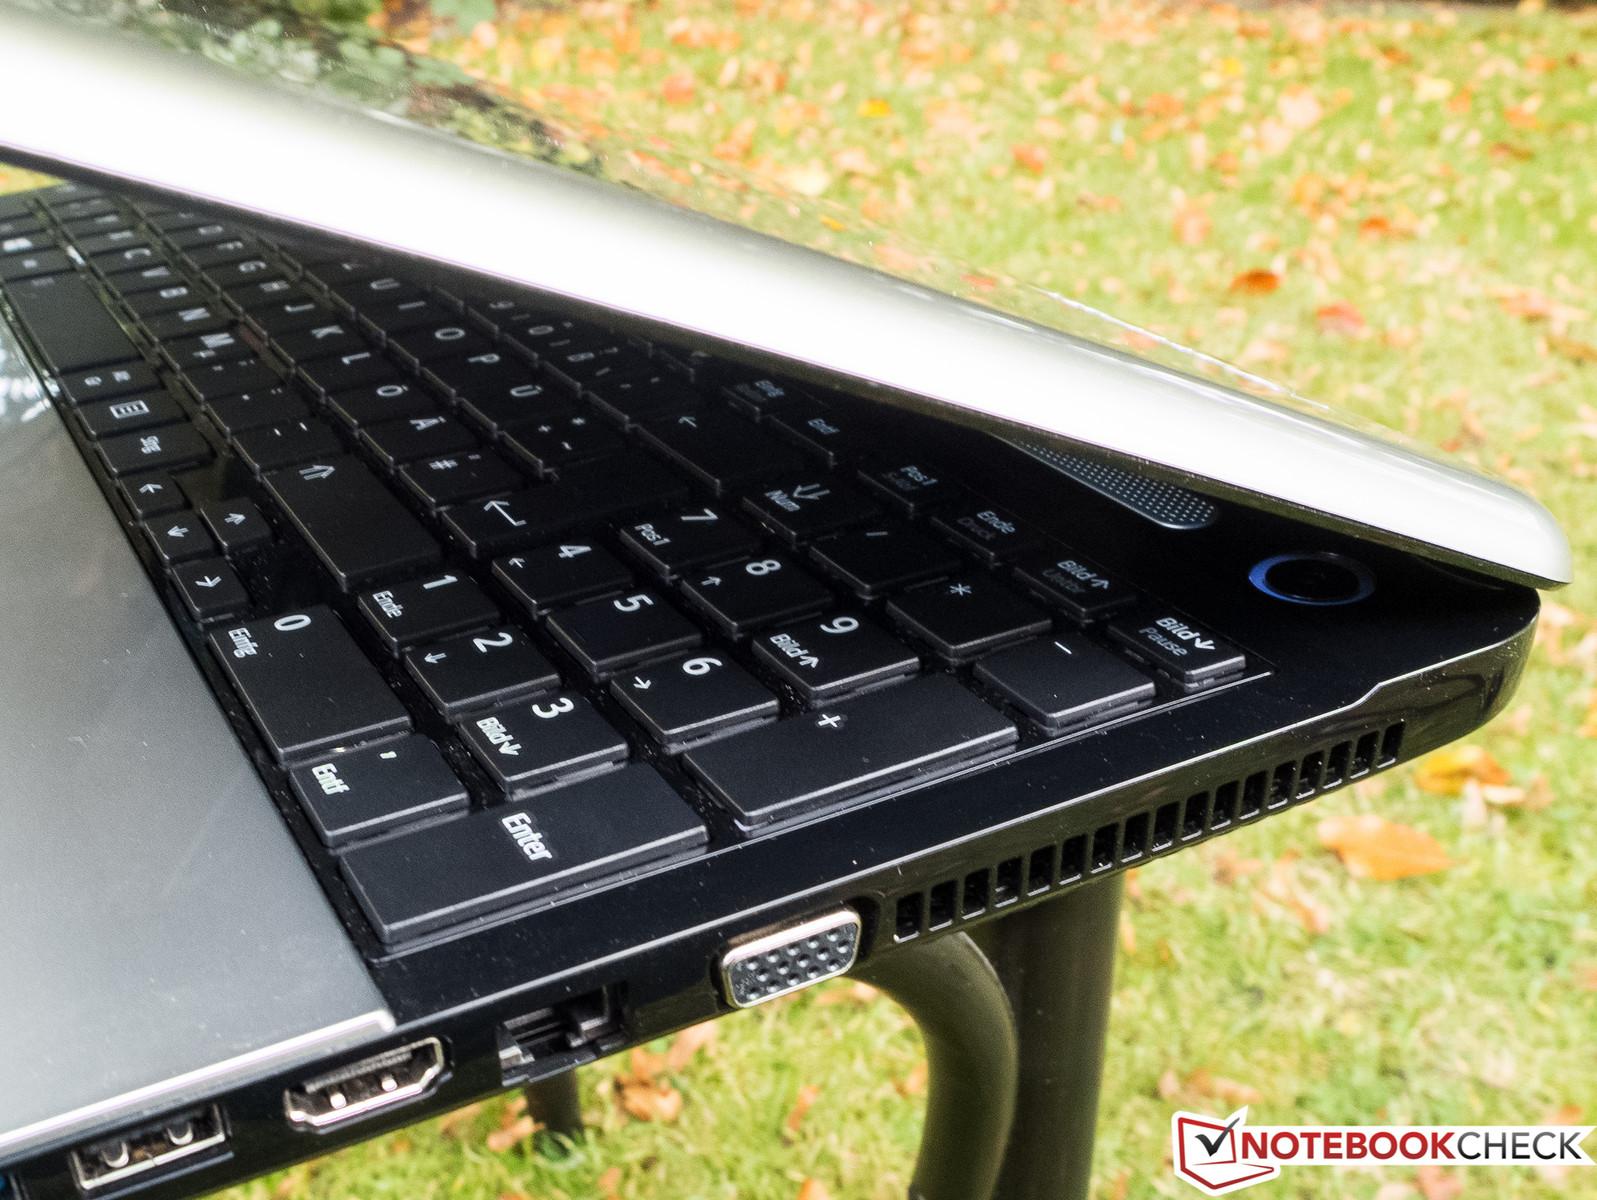 New Drivers: Toshiba Satellite C55-A Synaptics TouchPad